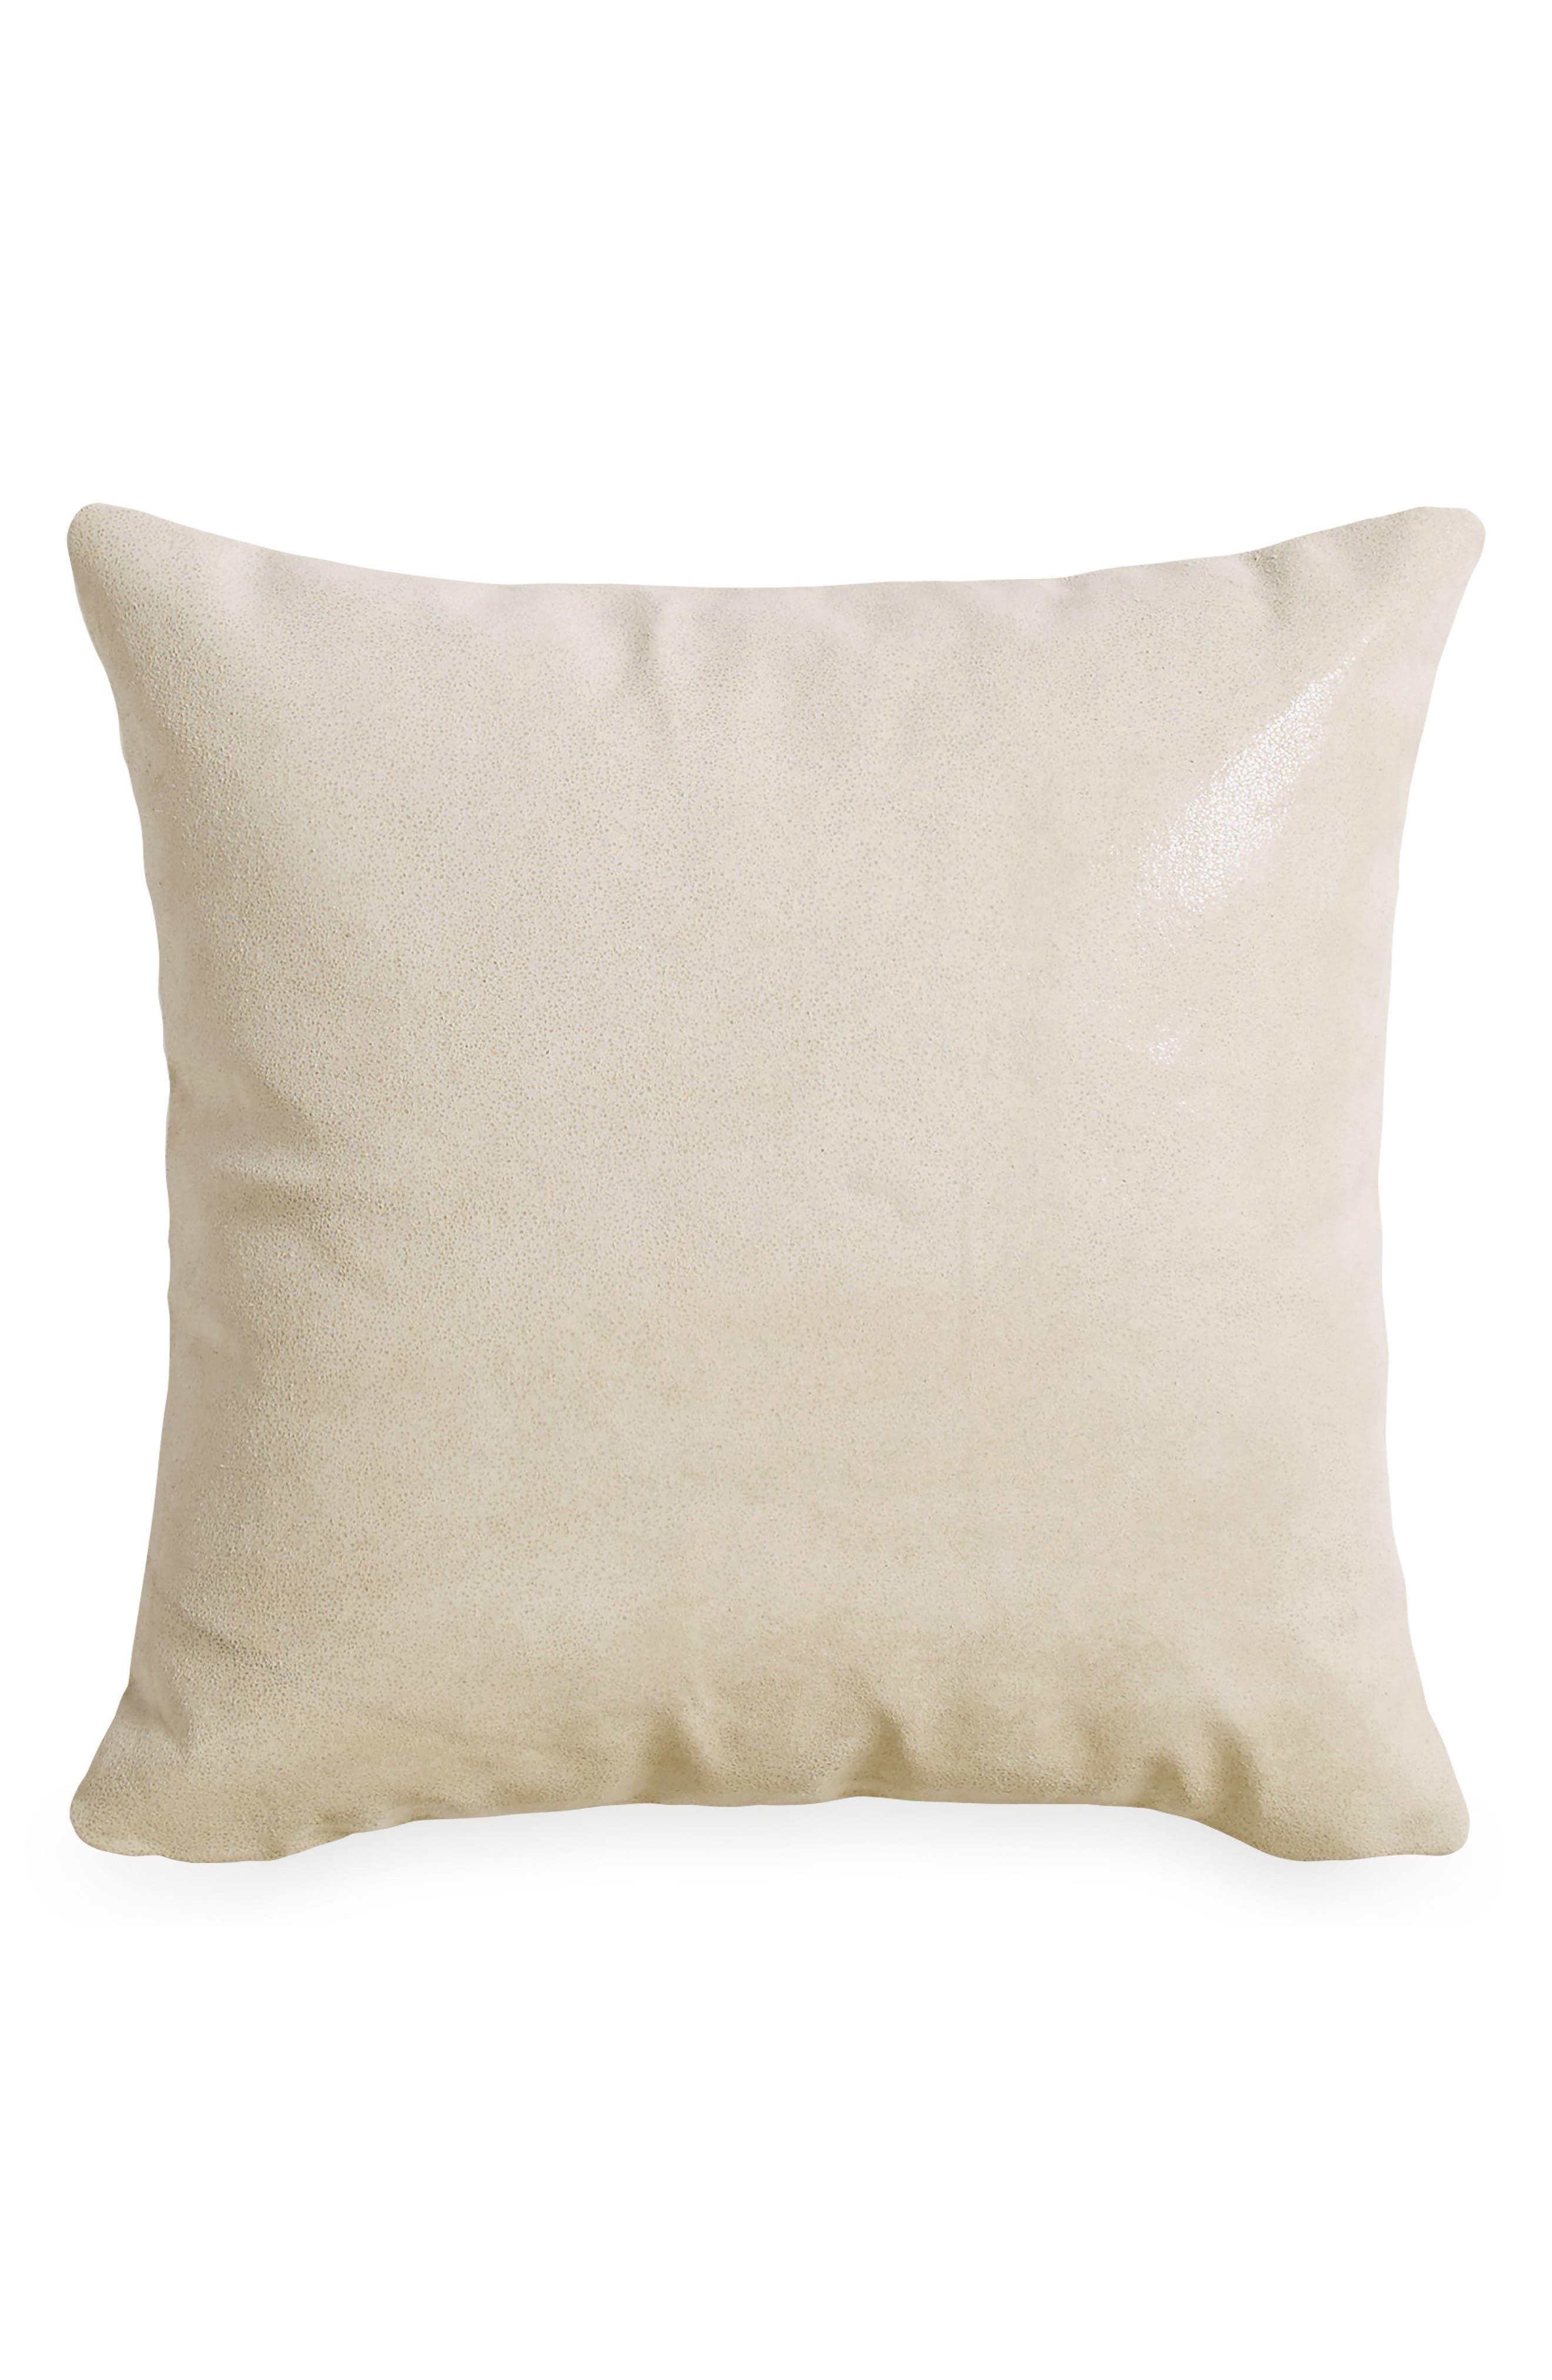 Tidal Accent Pillow,                             Main thumbnail 1, color,